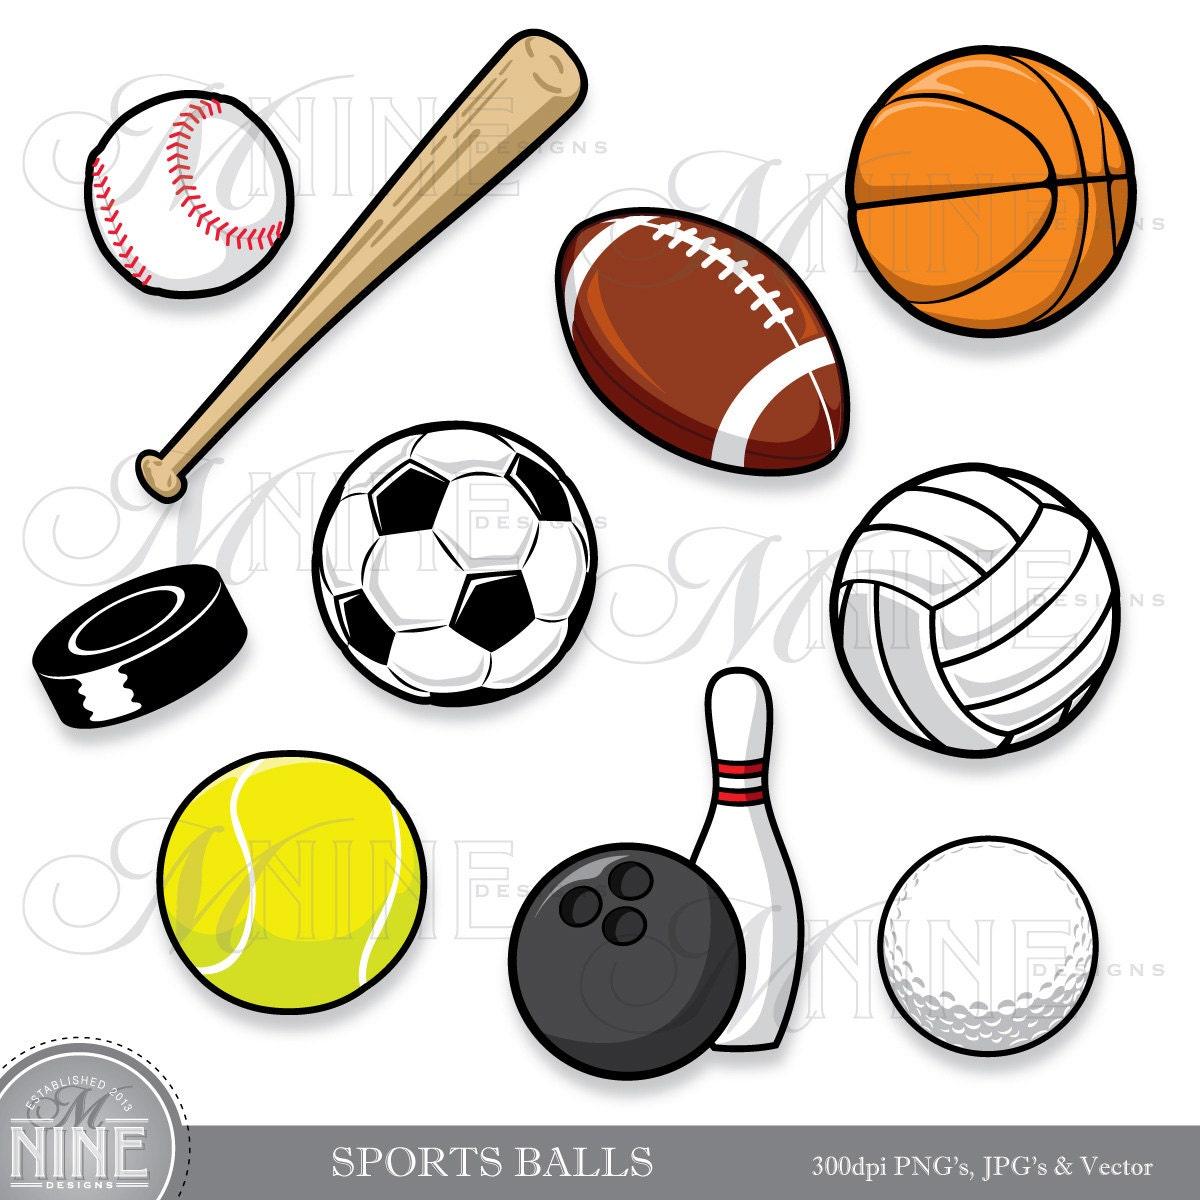 SPORTBÄLLE ClipArt: Clipart Sport Ball digitales von MNINEDESIGNS: https://www.etsy.com/de/listing/170734735/sports-balls-clip-art...